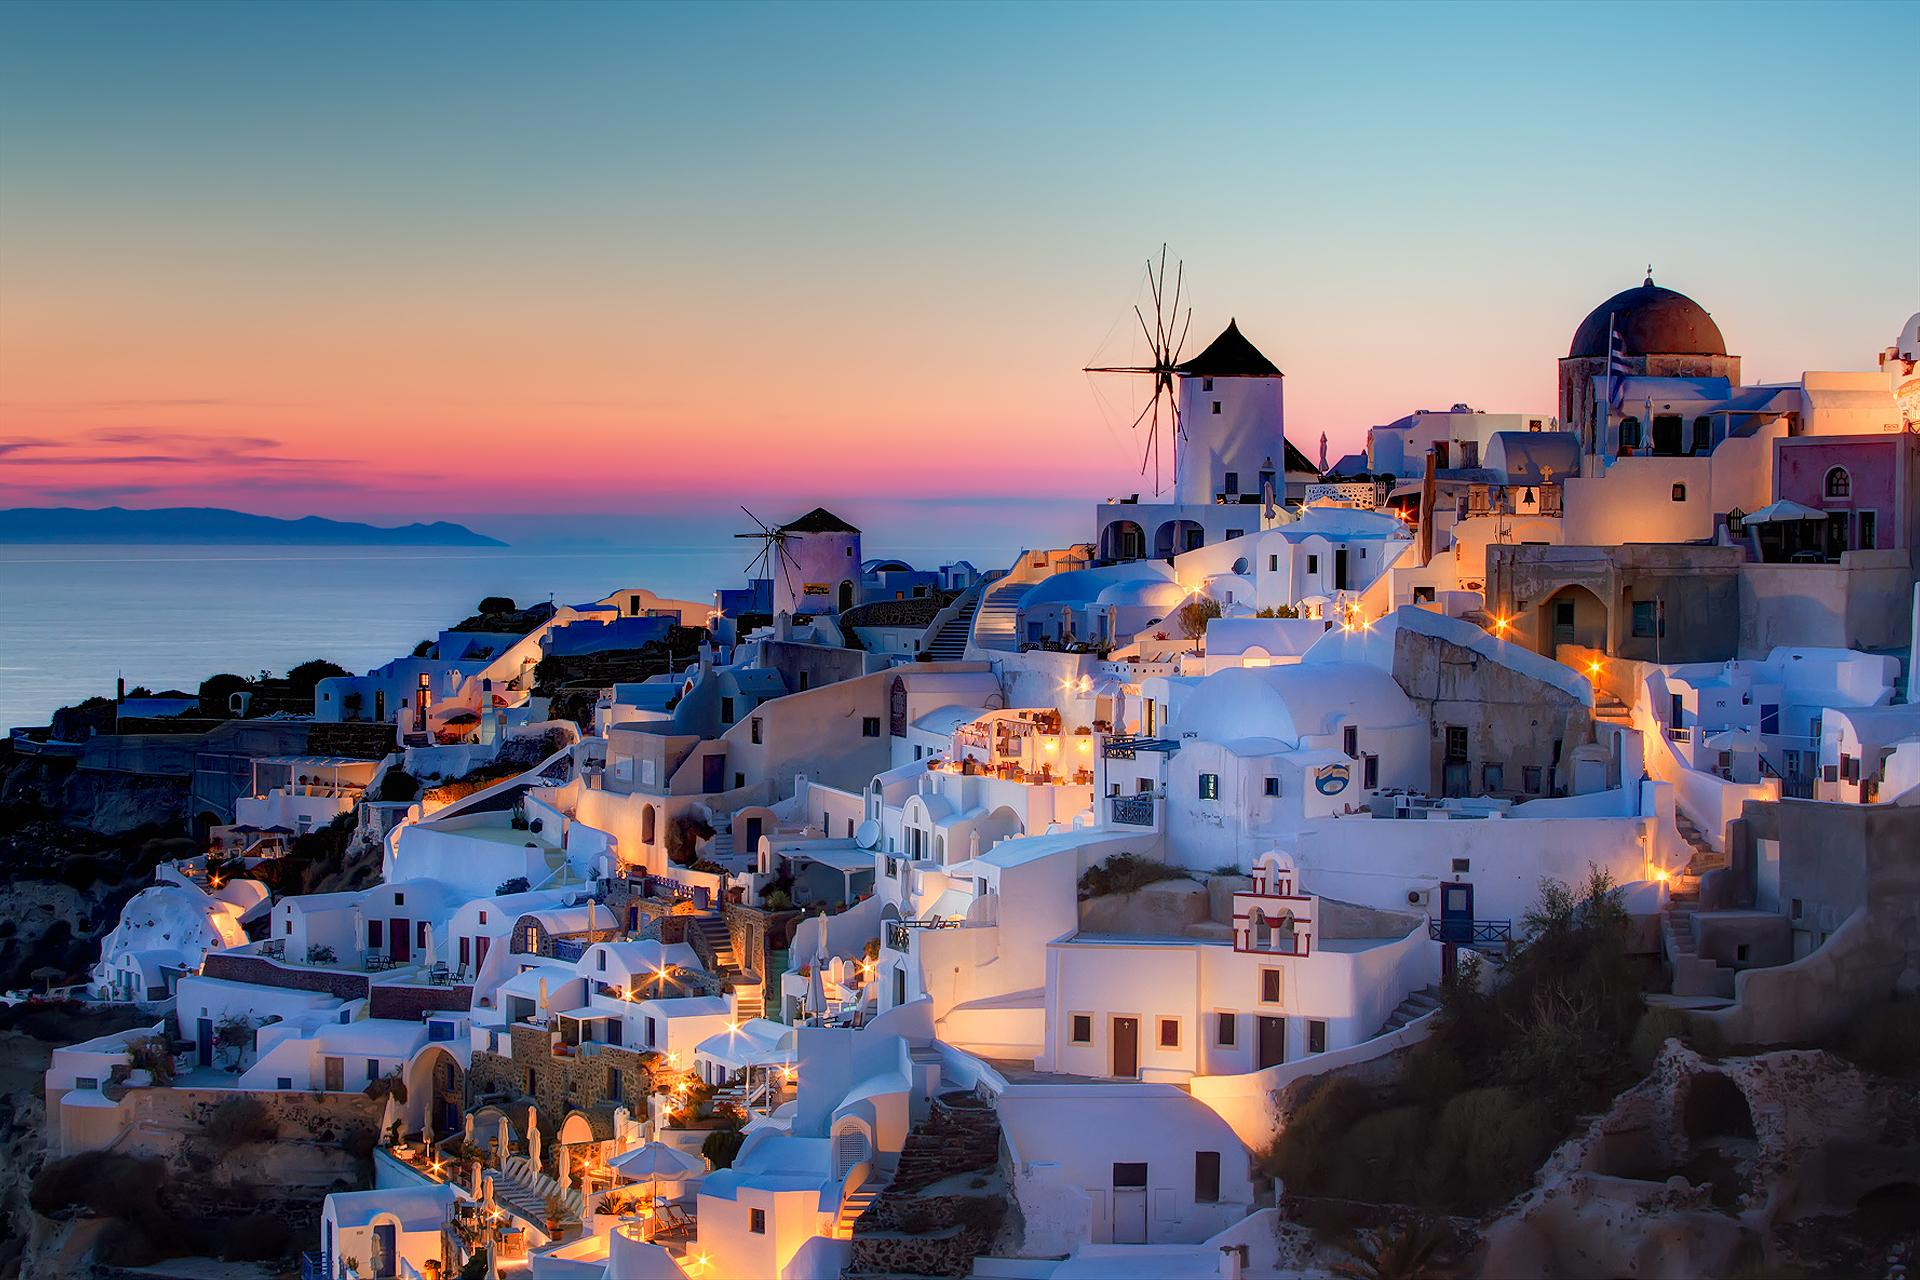 Antorini in Greece is the most romantic getaway of Greece